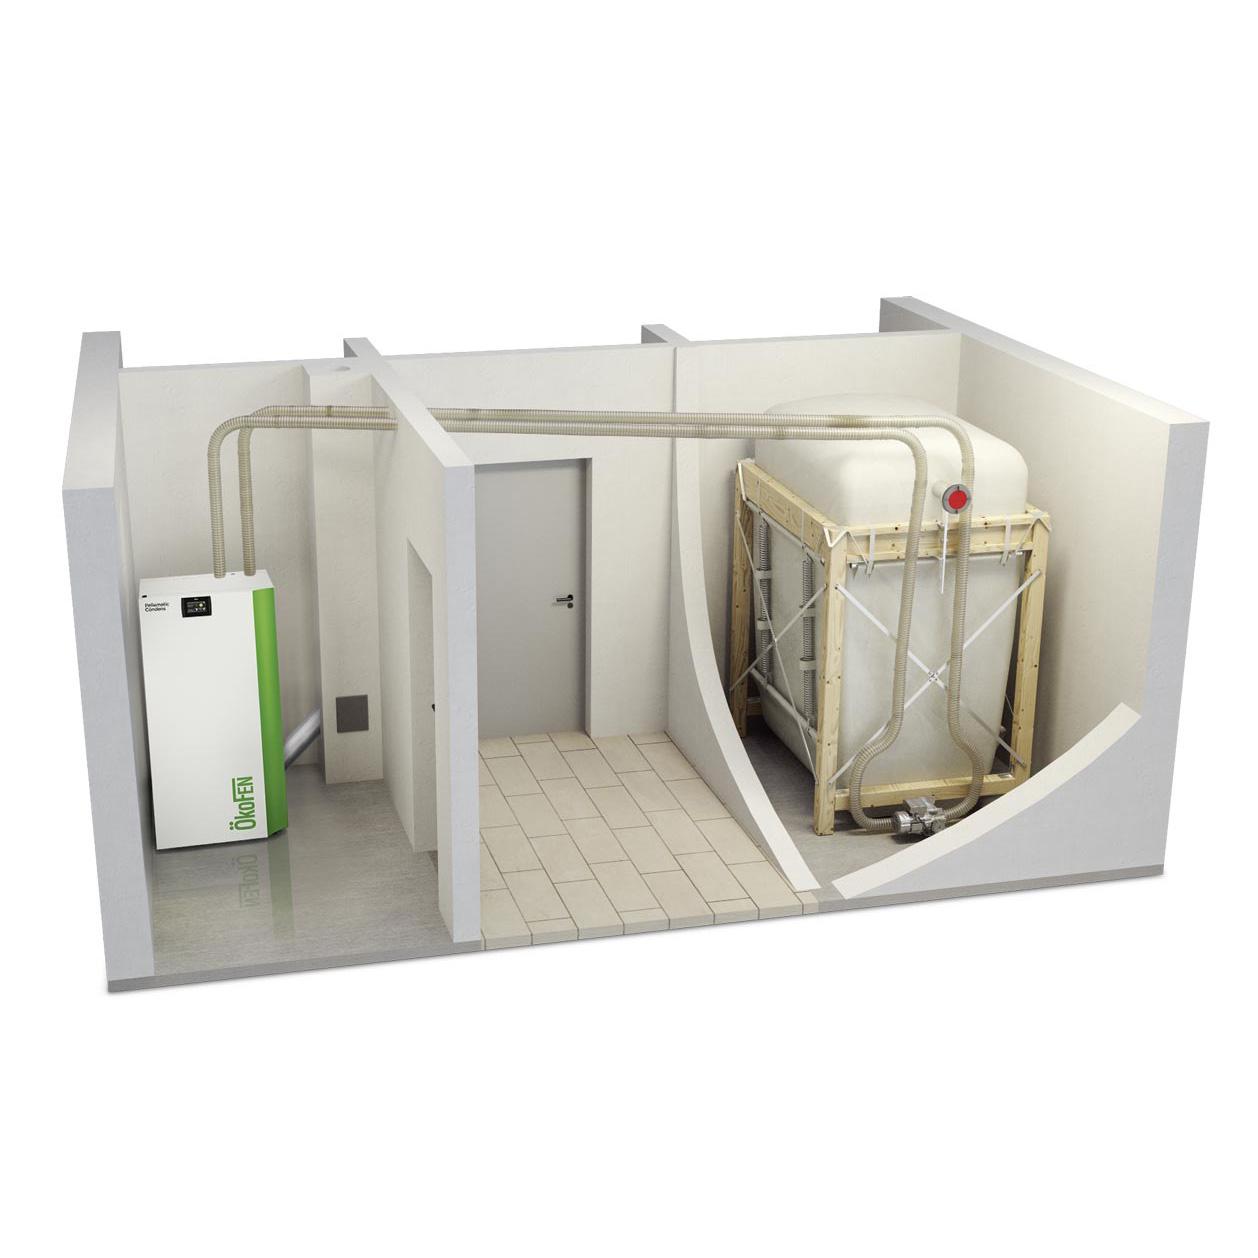 Pelletketel installatie Okofen Condens Energreen pelletopslag silo